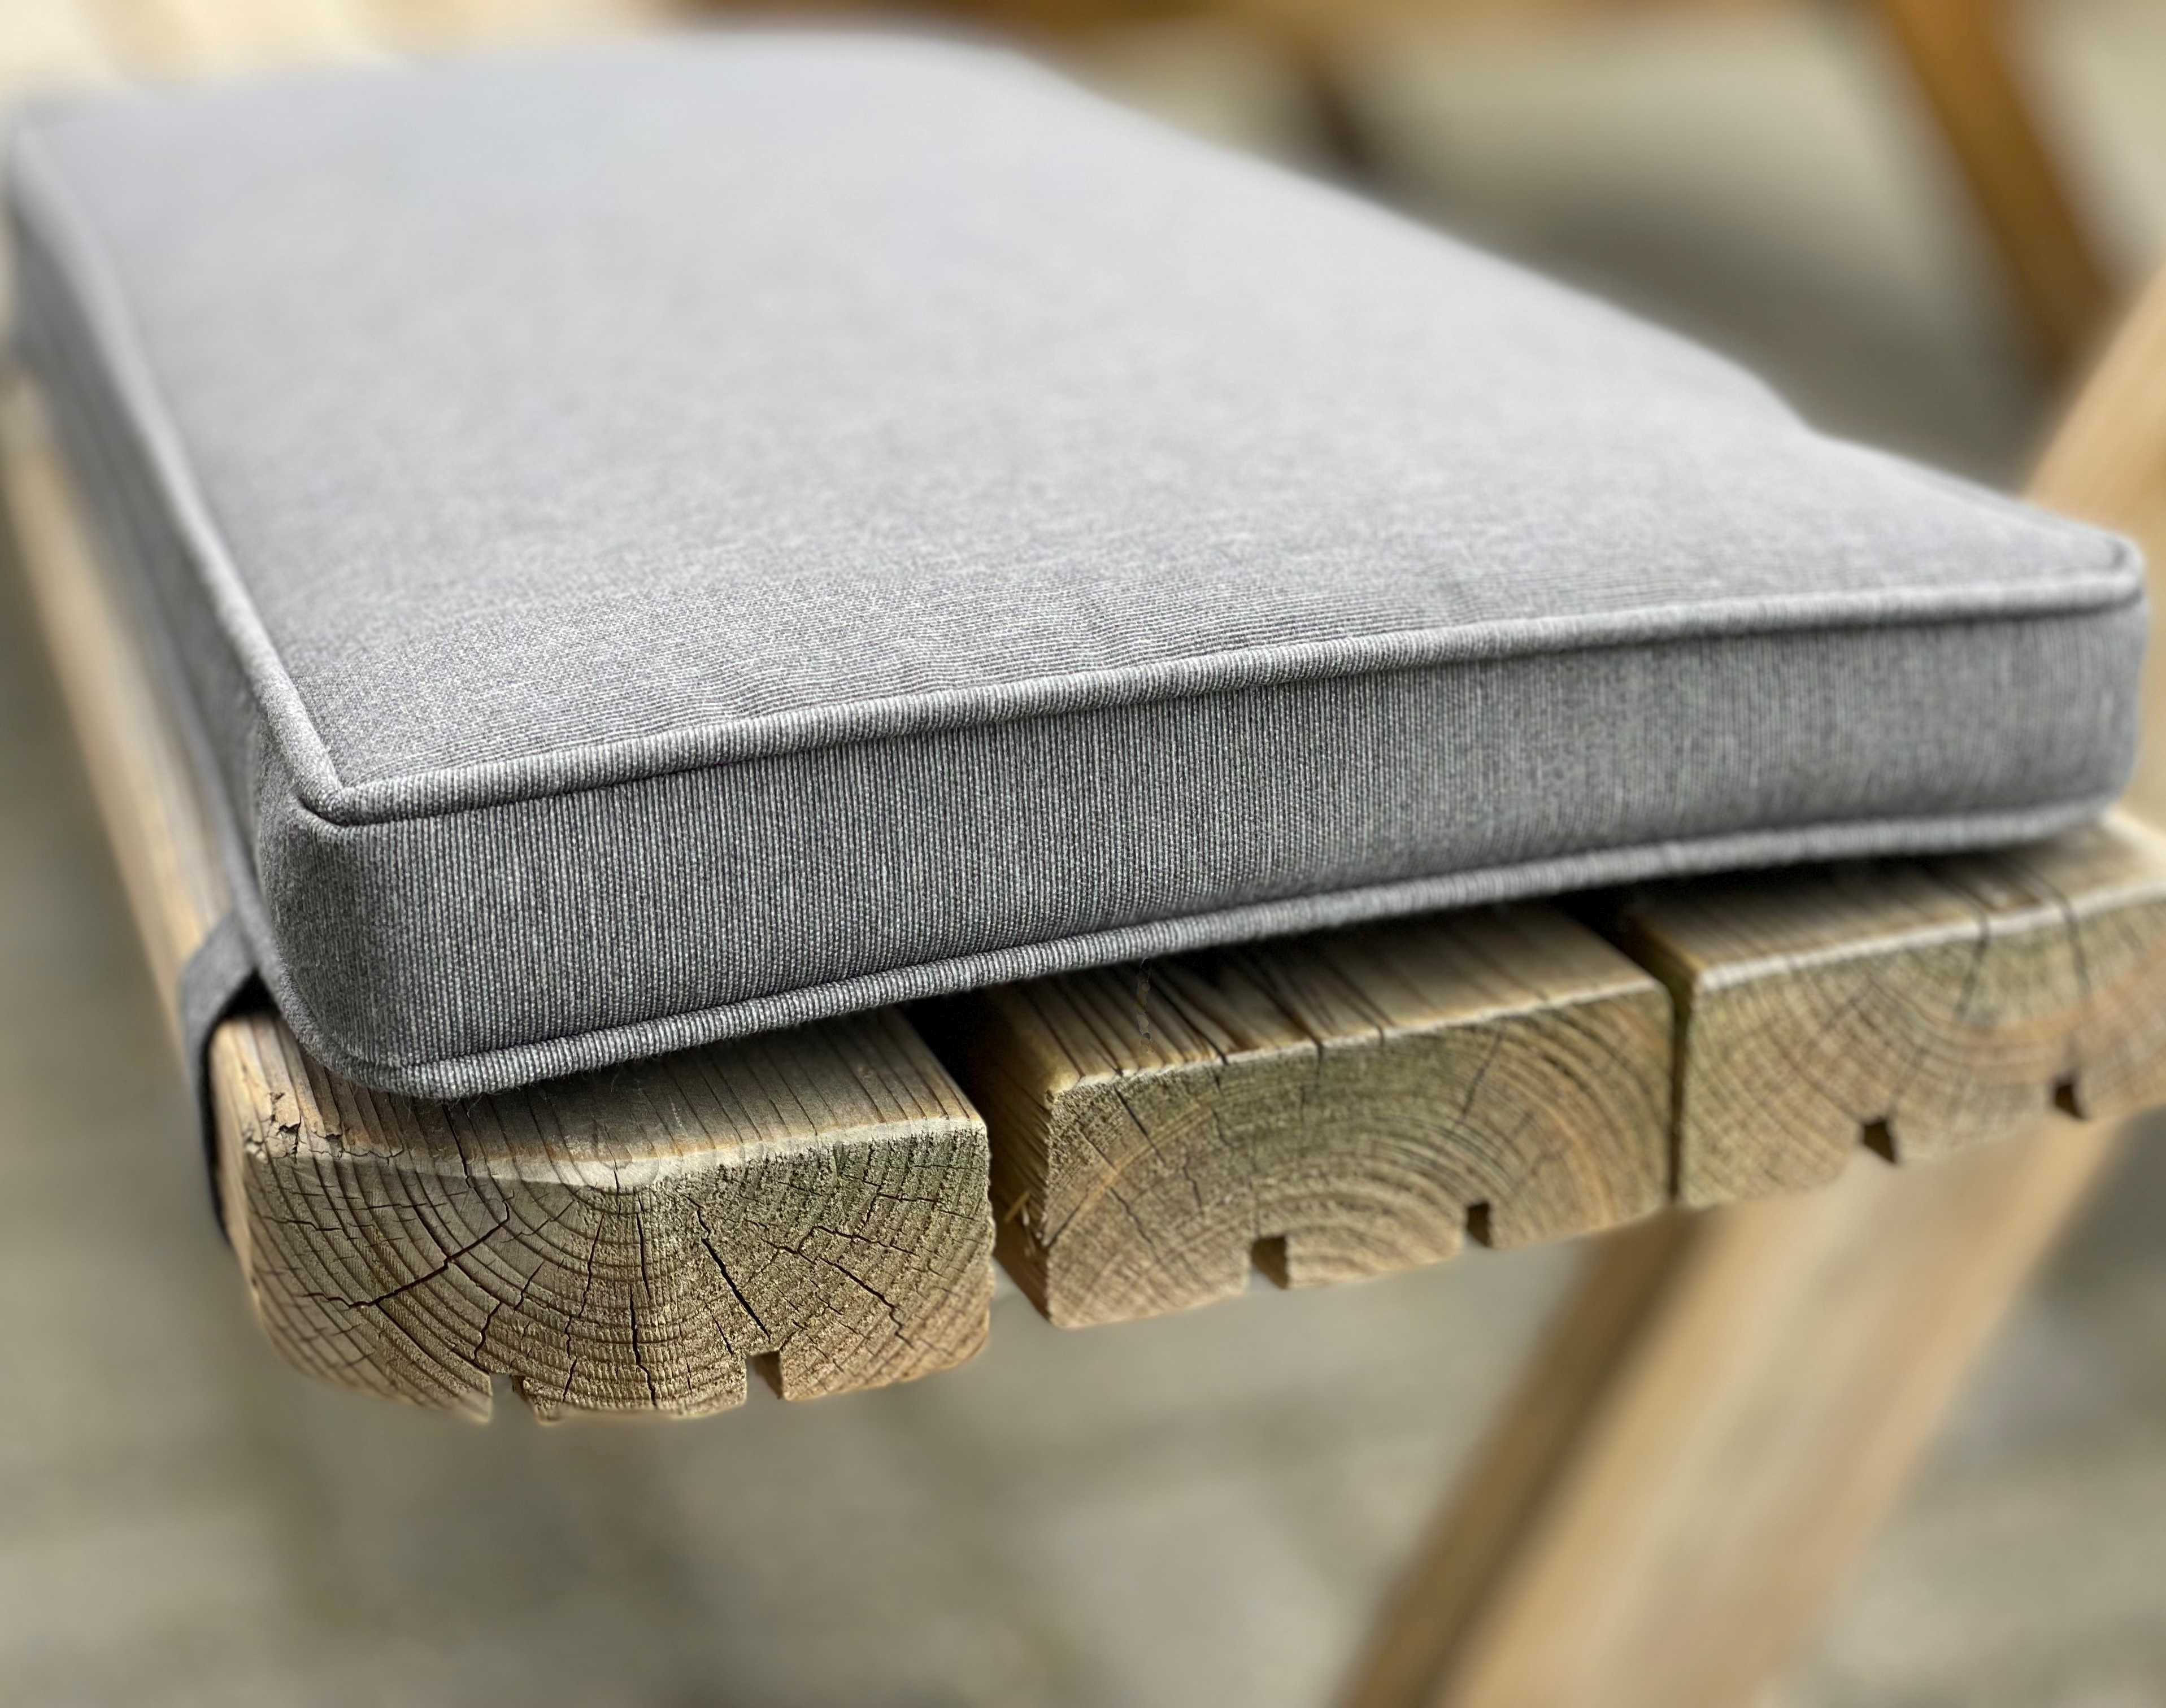 Madison tuinkussen picknicktafel, 28 x 60 cm (1-zits) - outdoor oxford grey